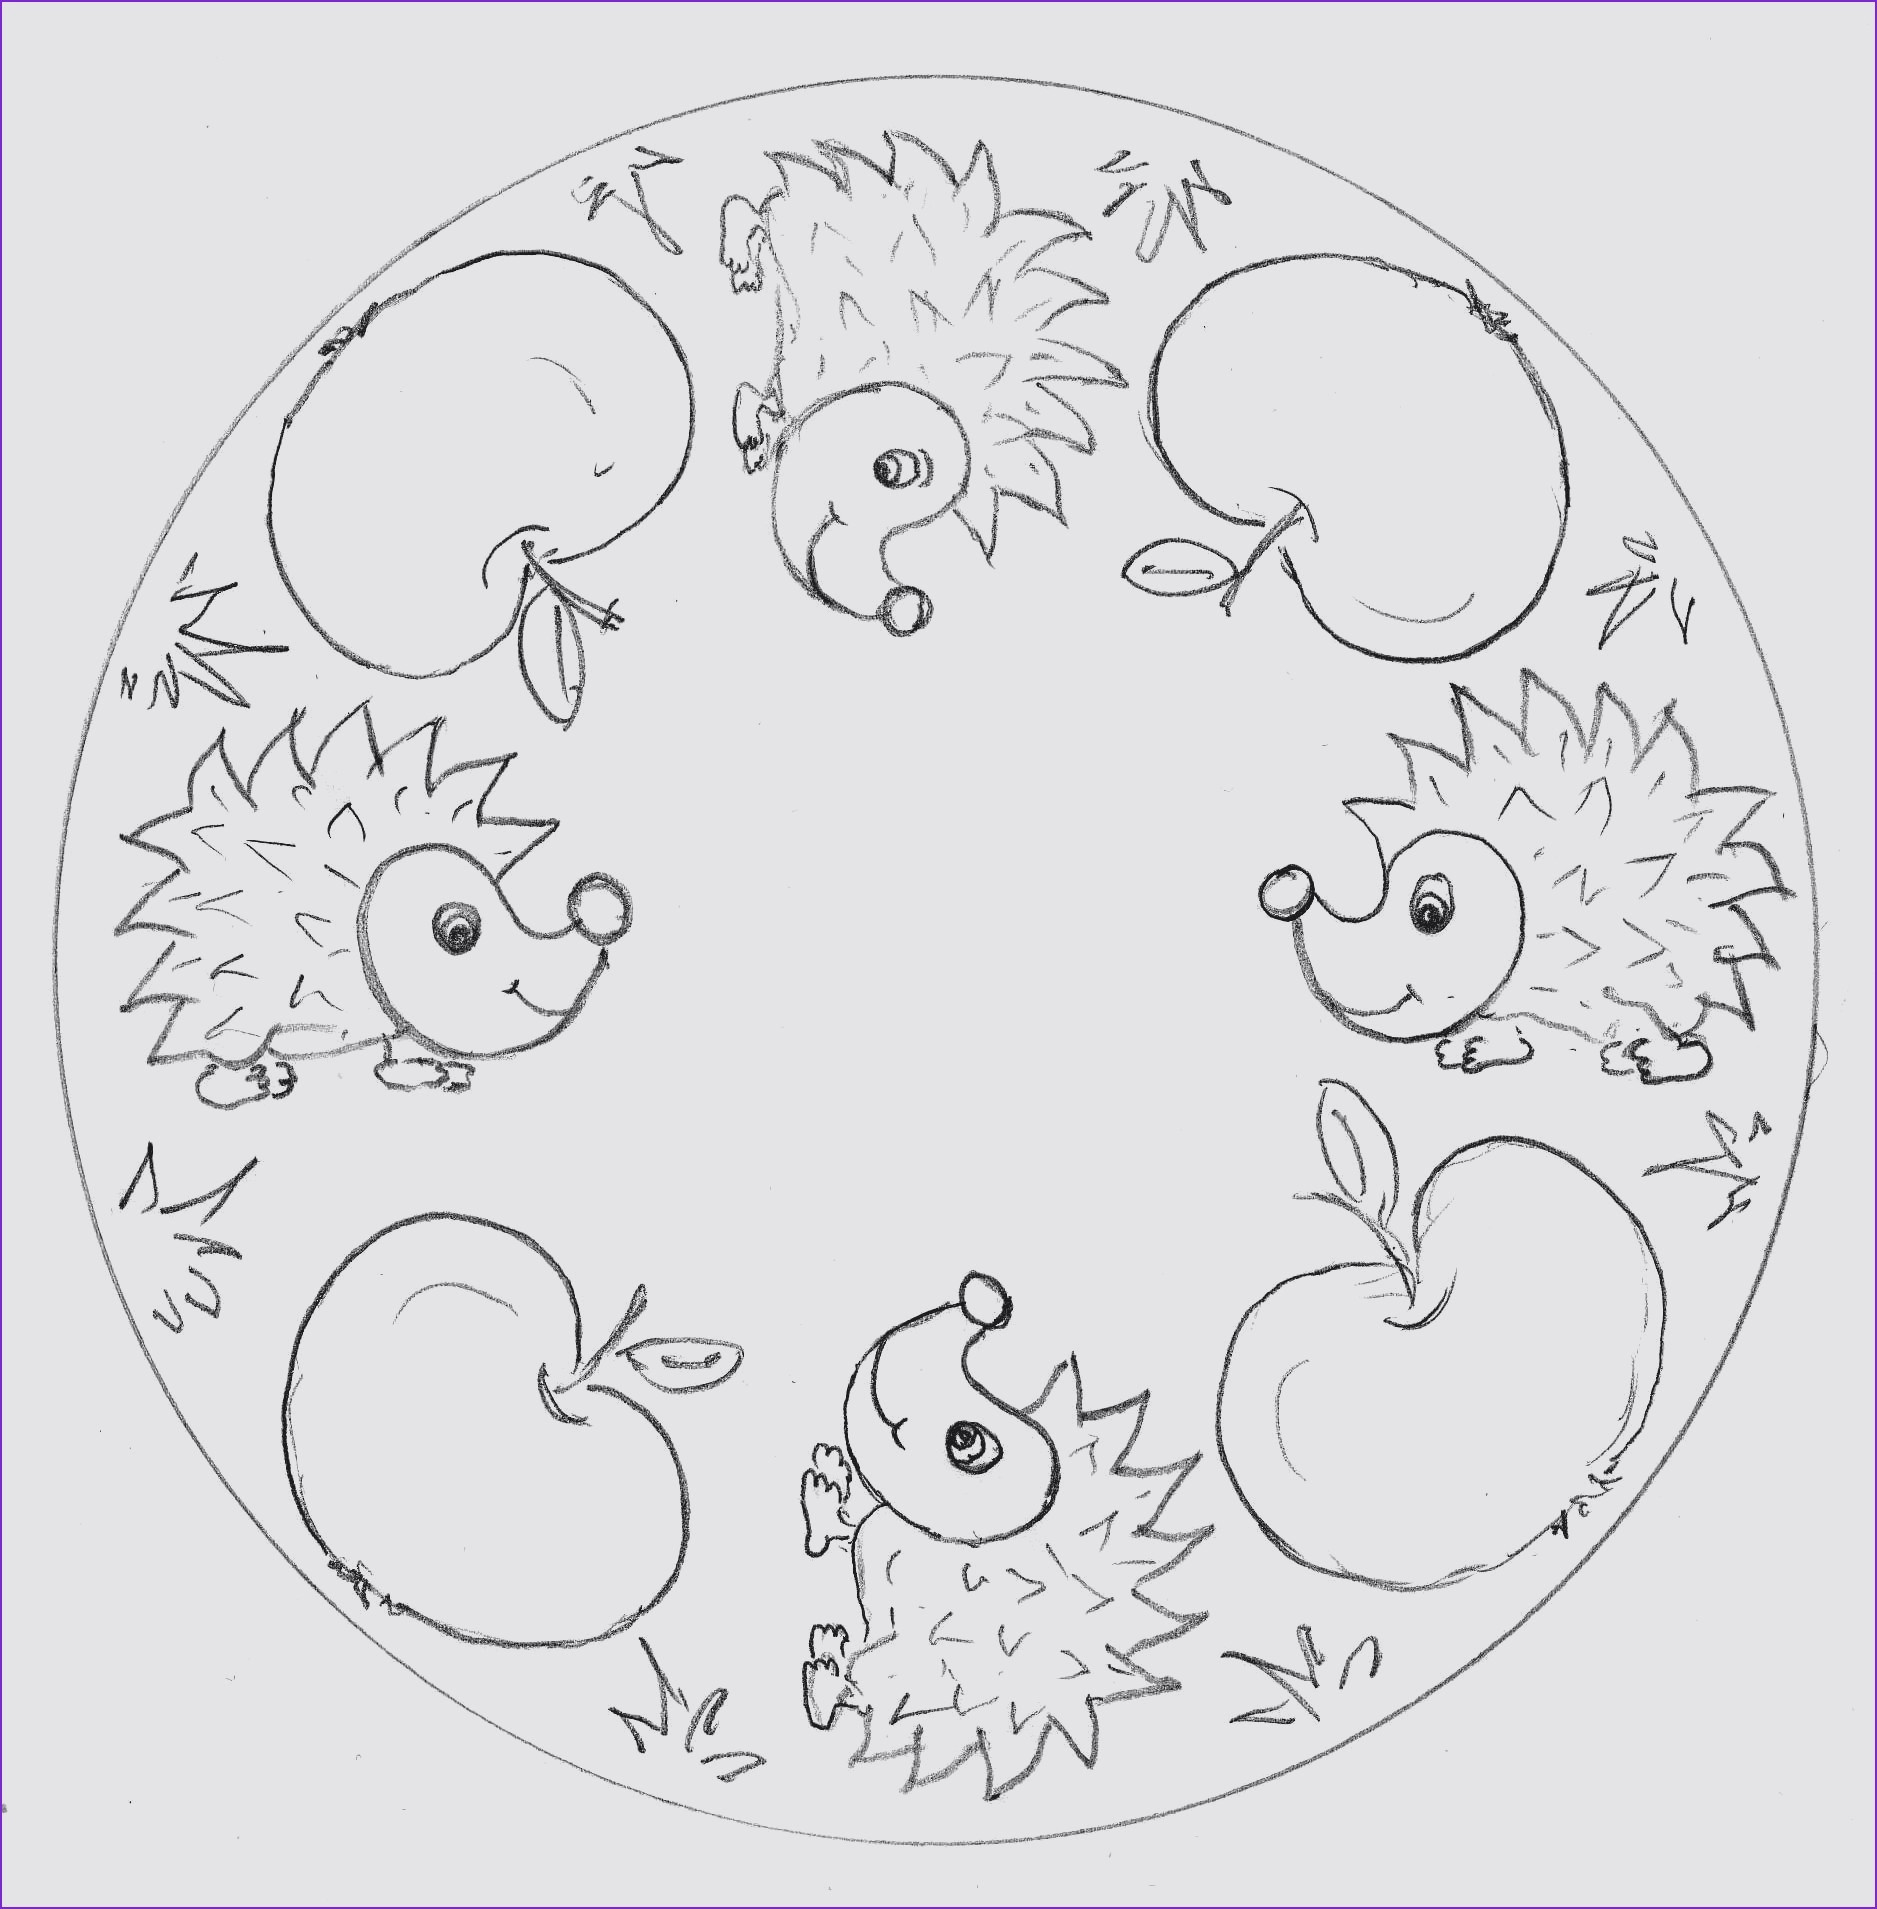 Herz Mandalas Zum Ausmalen Neu Ausmalbilder Mandala Erwachsene Lernspiele Färbung Bilder Stock